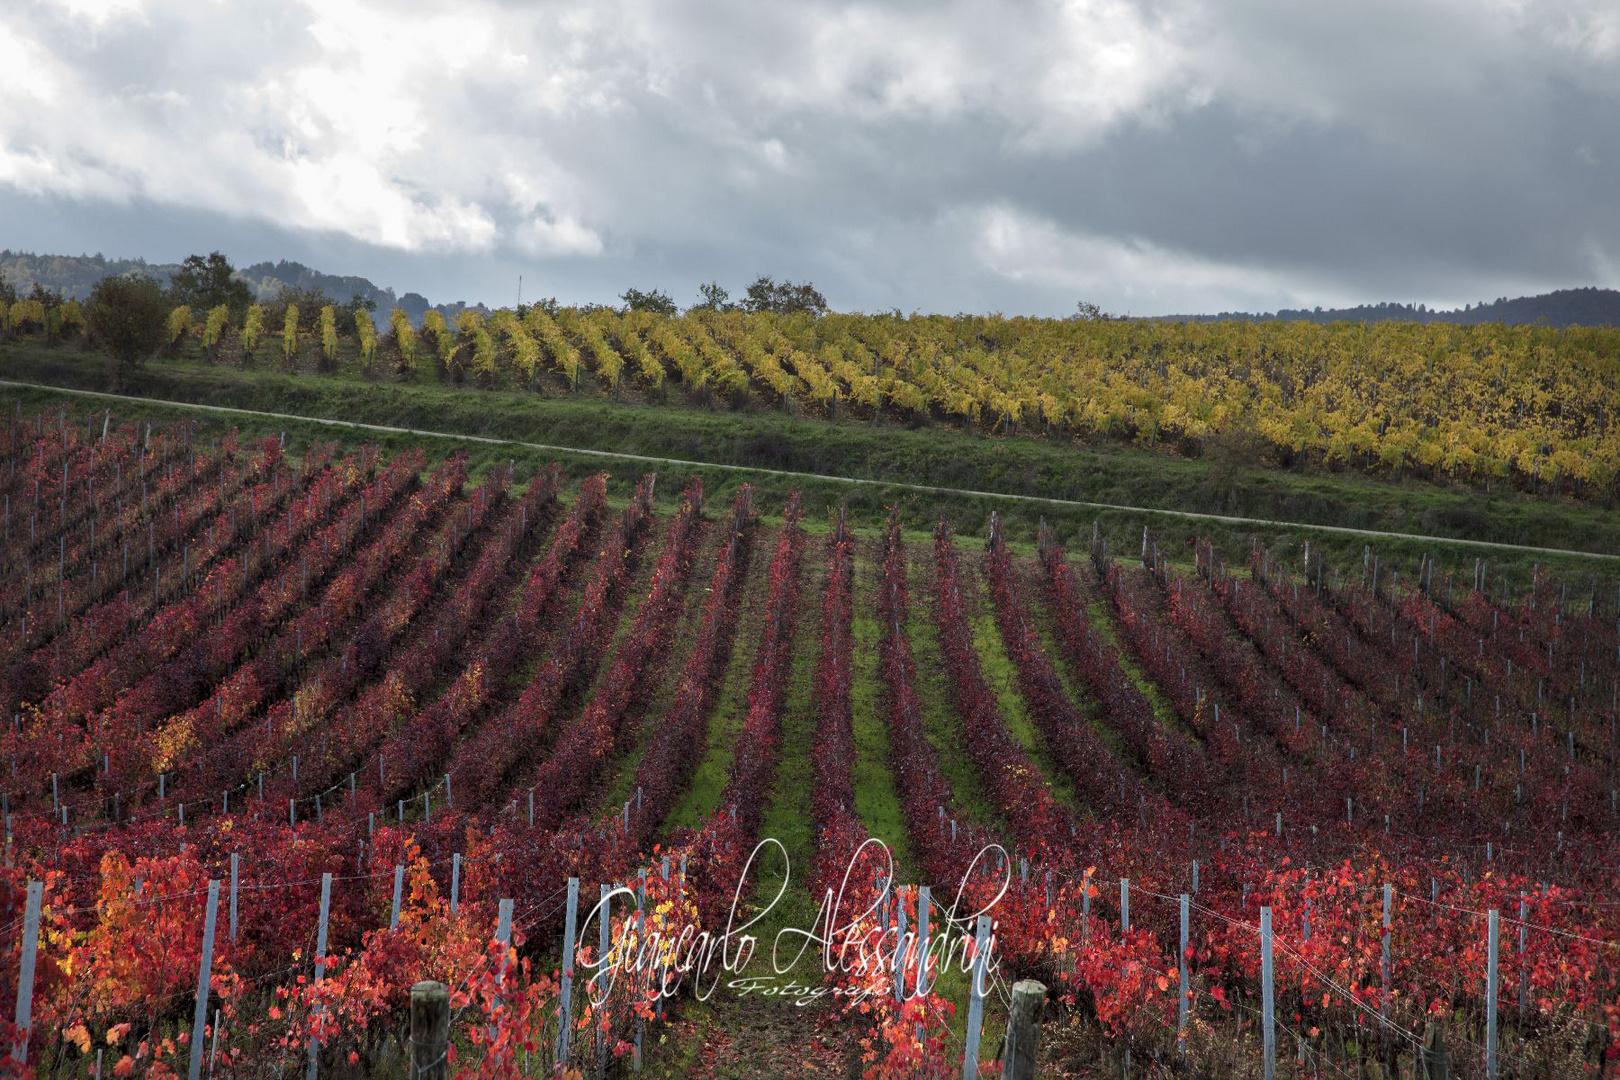 La Val di Chiana-Toscana